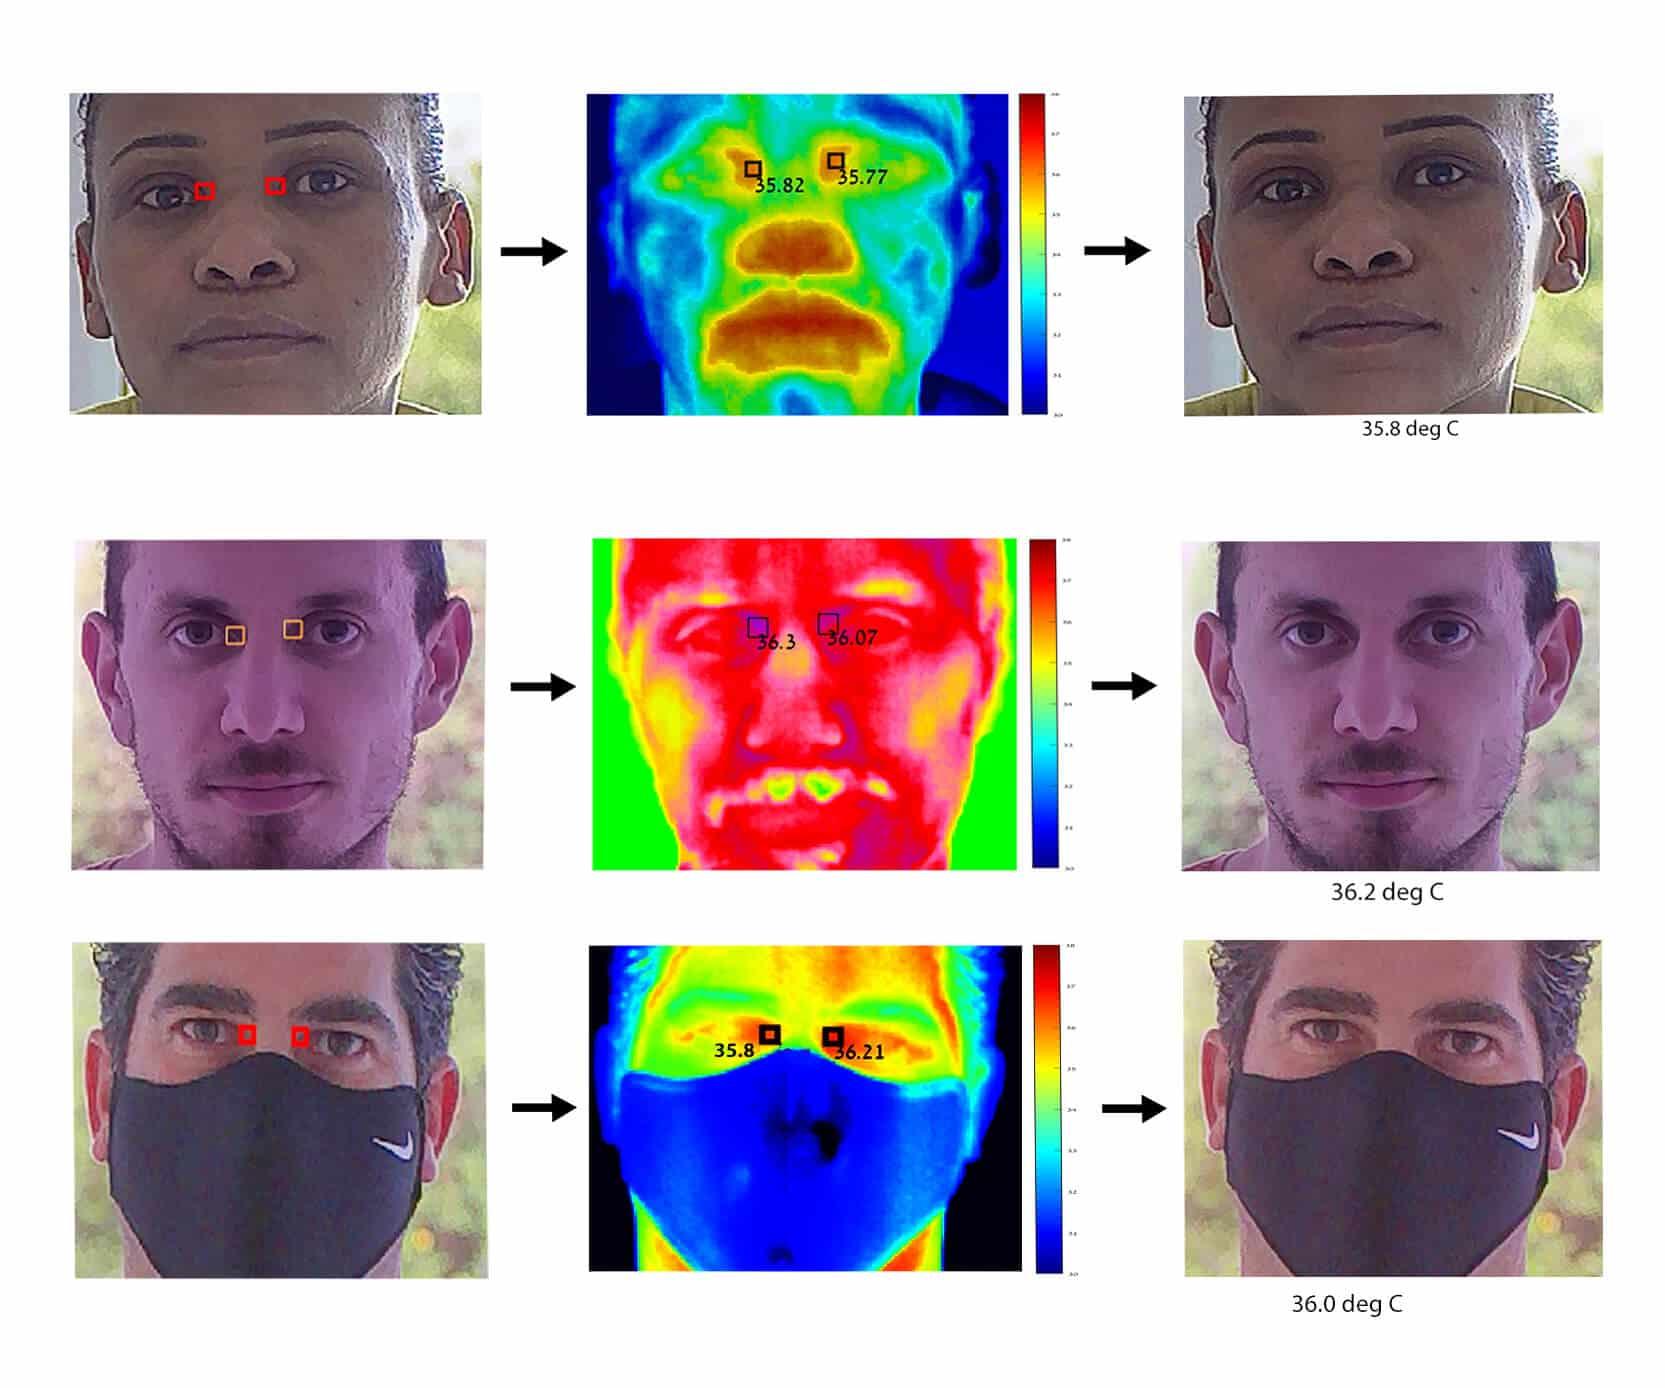 Body Temperature Screening